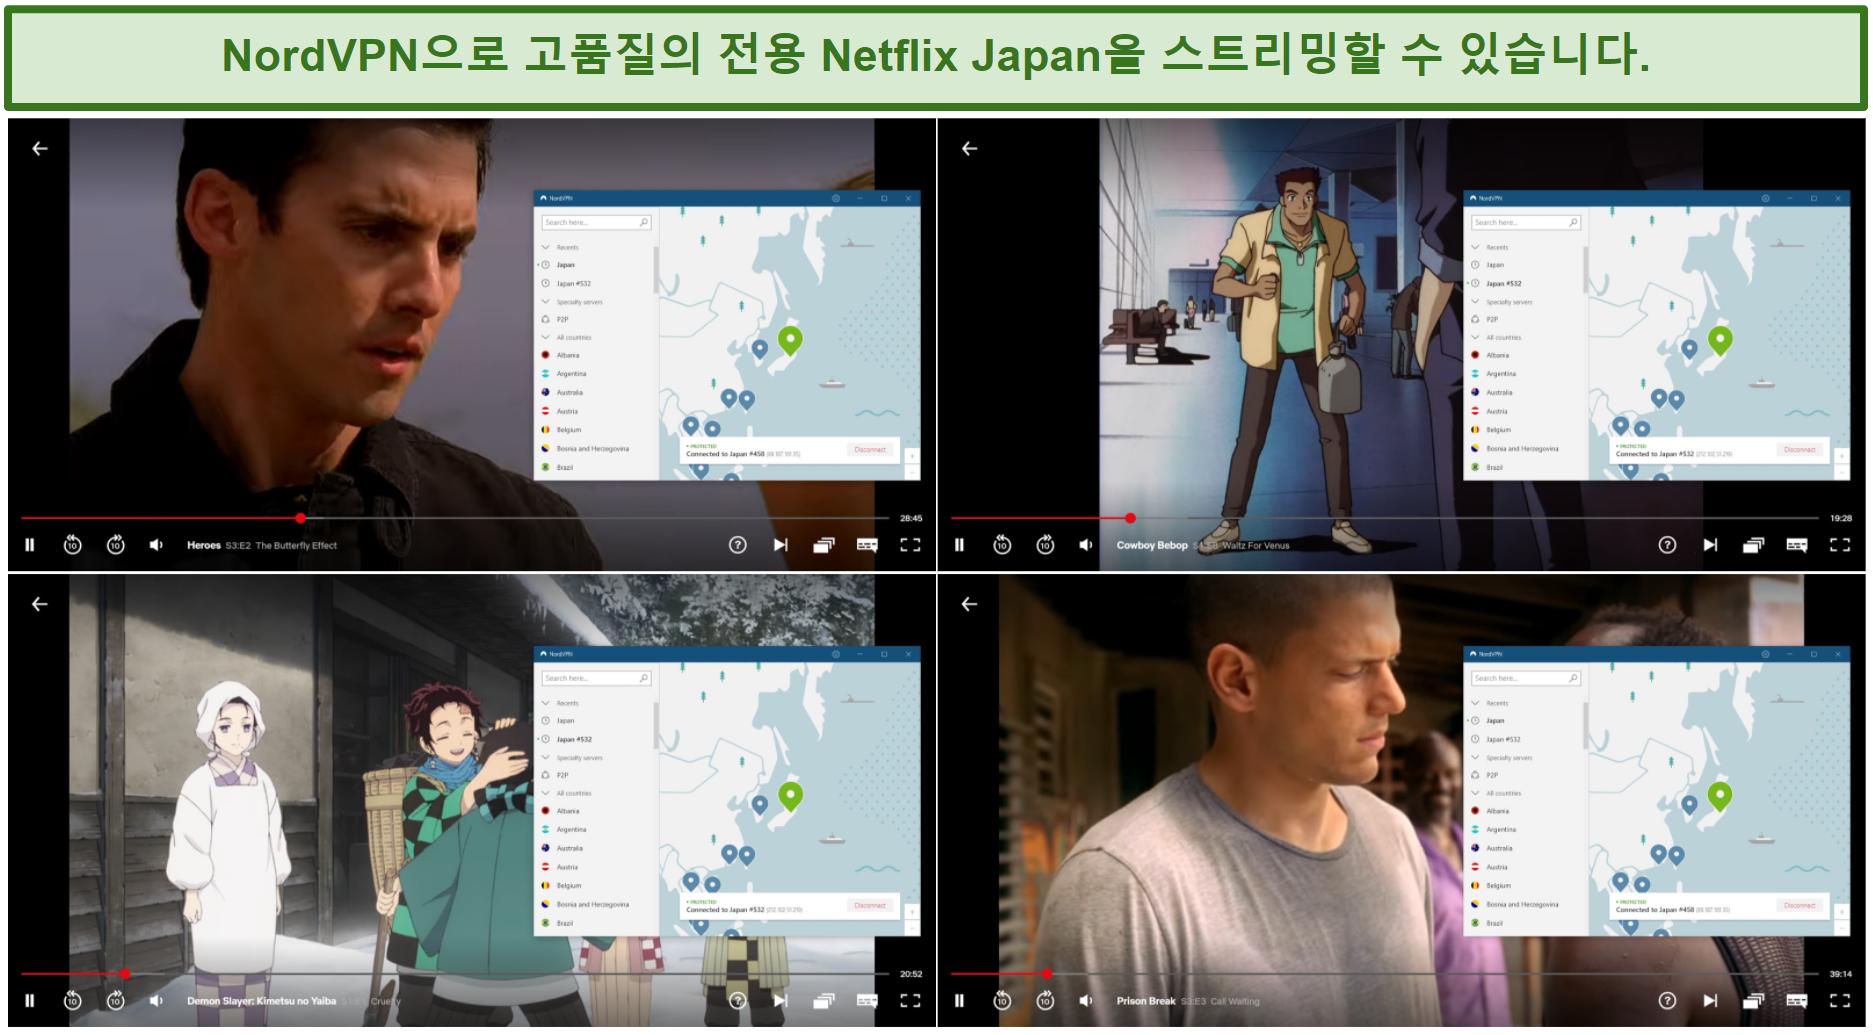 NordVPN 스트리밍 Prison Break, Cowboy Bebop, Heroes 및 Demon Slayer : Netflix Japan의 Kimetsu no Yaiba 스크린 샷